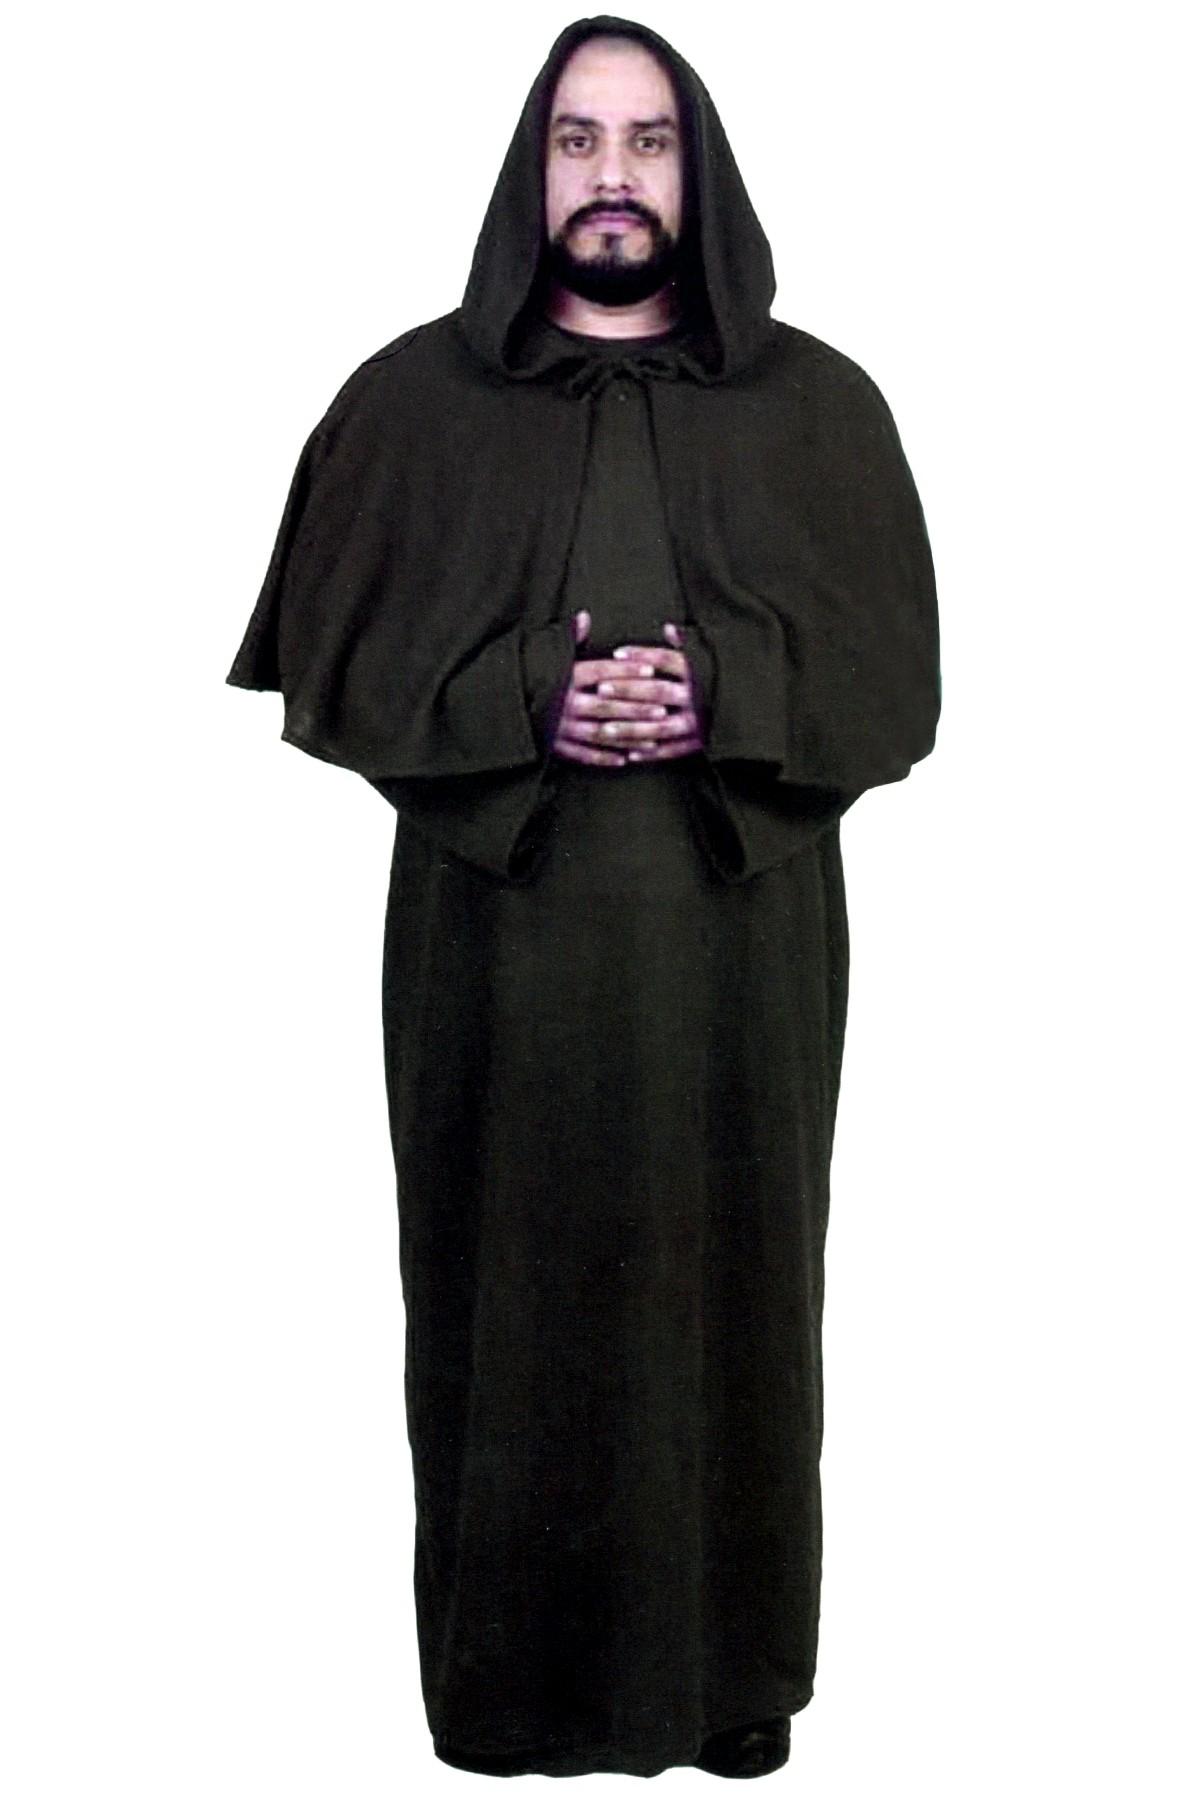 Rel Monk's Robe 3X